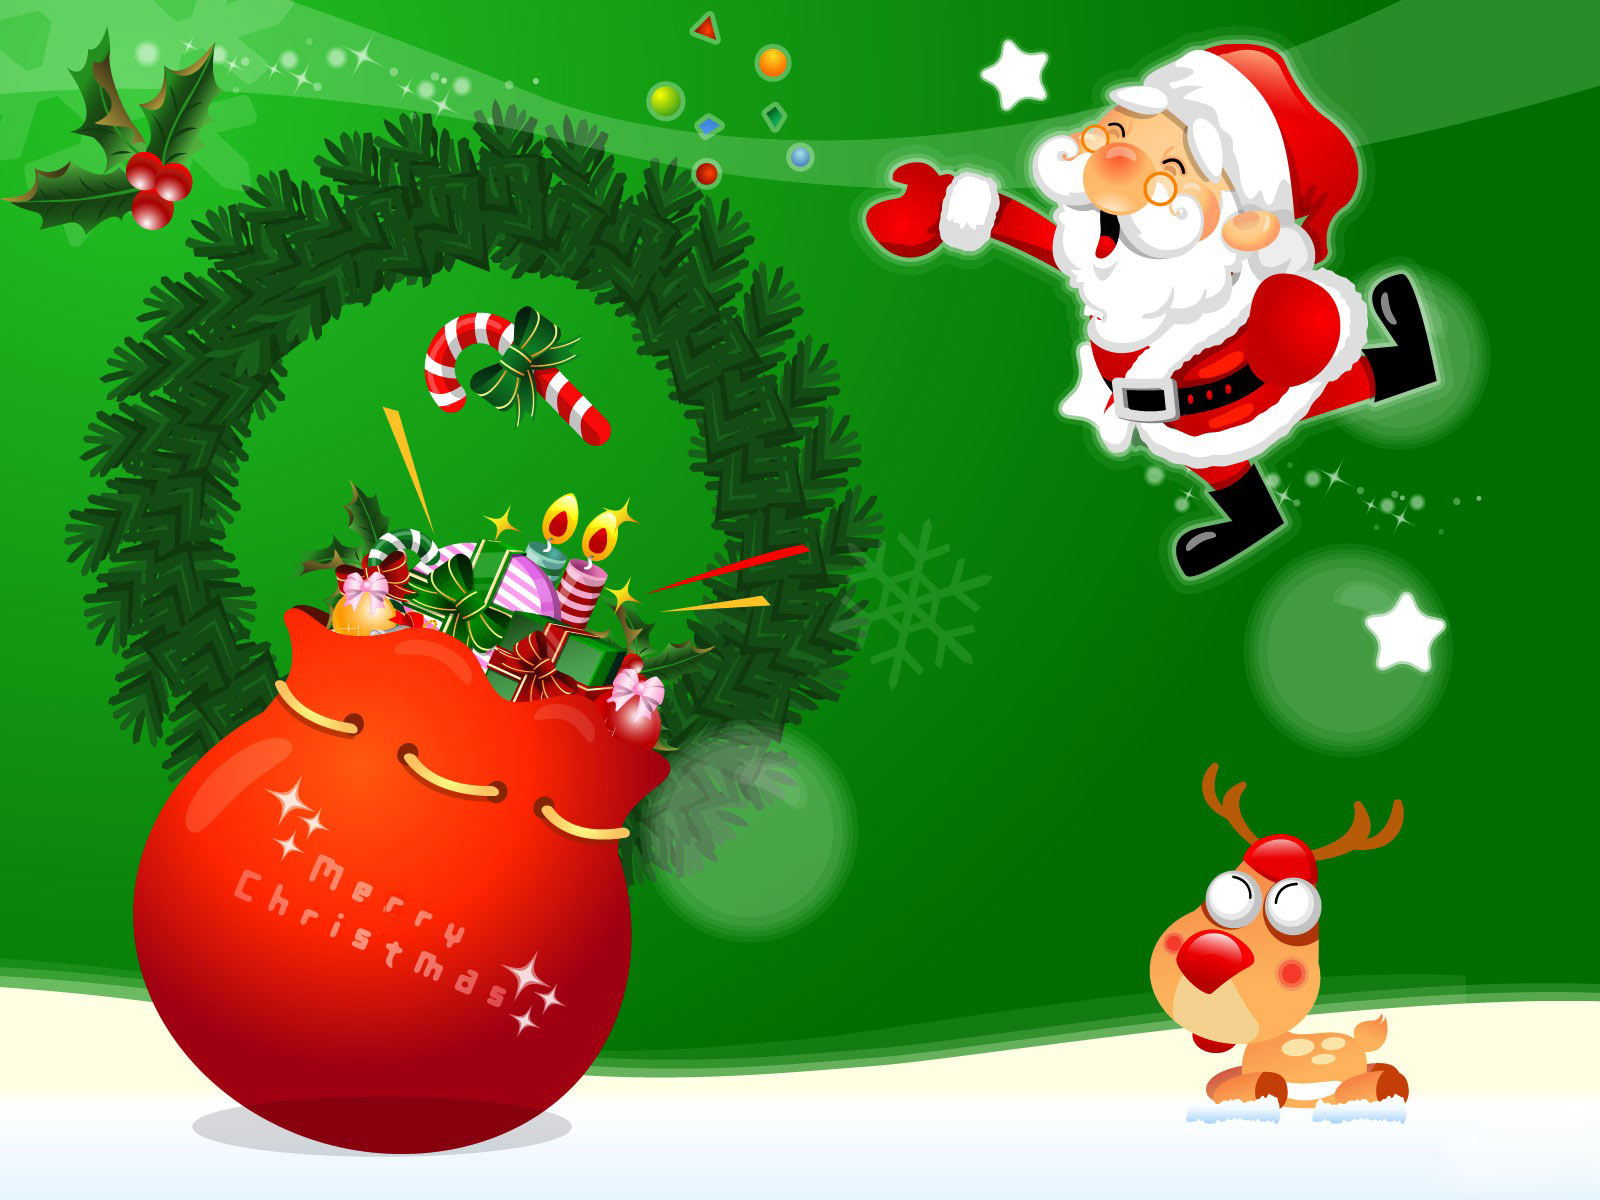 Christmas Ipad Wallpapers: Free IPad Retina HD Wallpapers